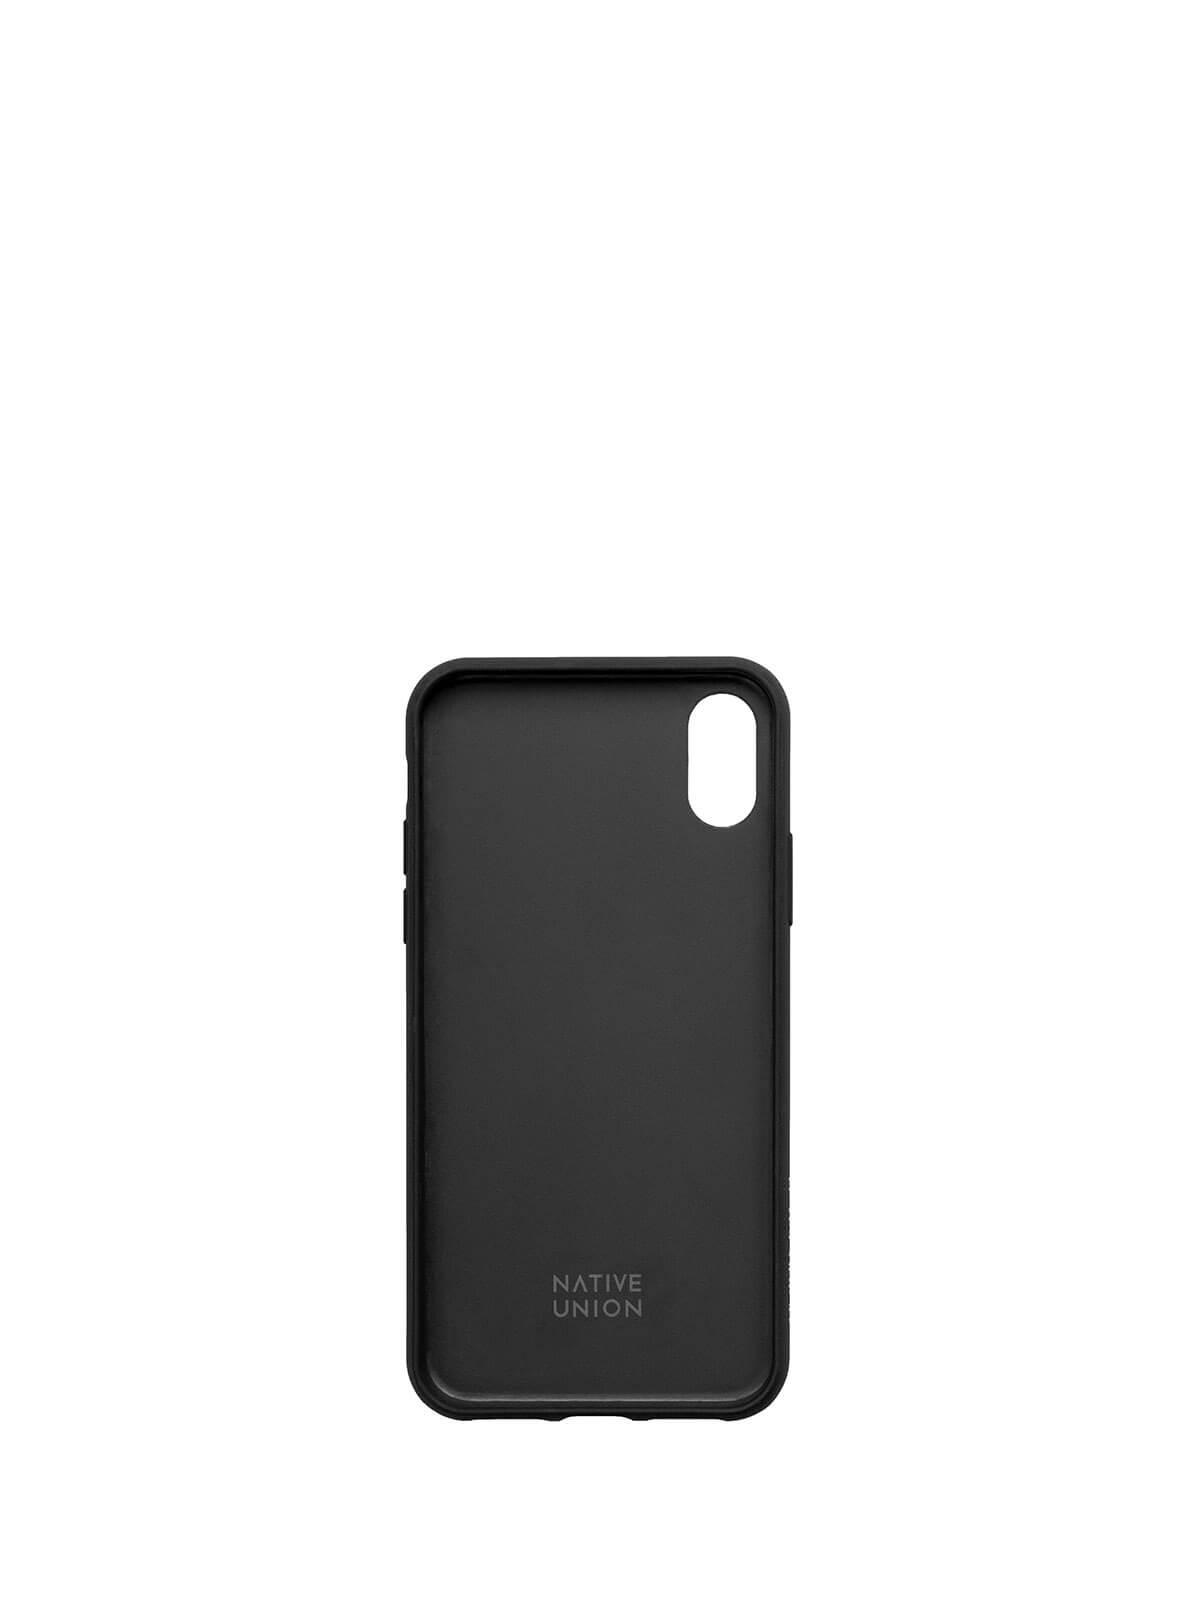 NATIVE UNION 水磨石手機殼 - 宇宙黑 ( iPhone XS / iPhone X ) - LUXJOY 精品購物網